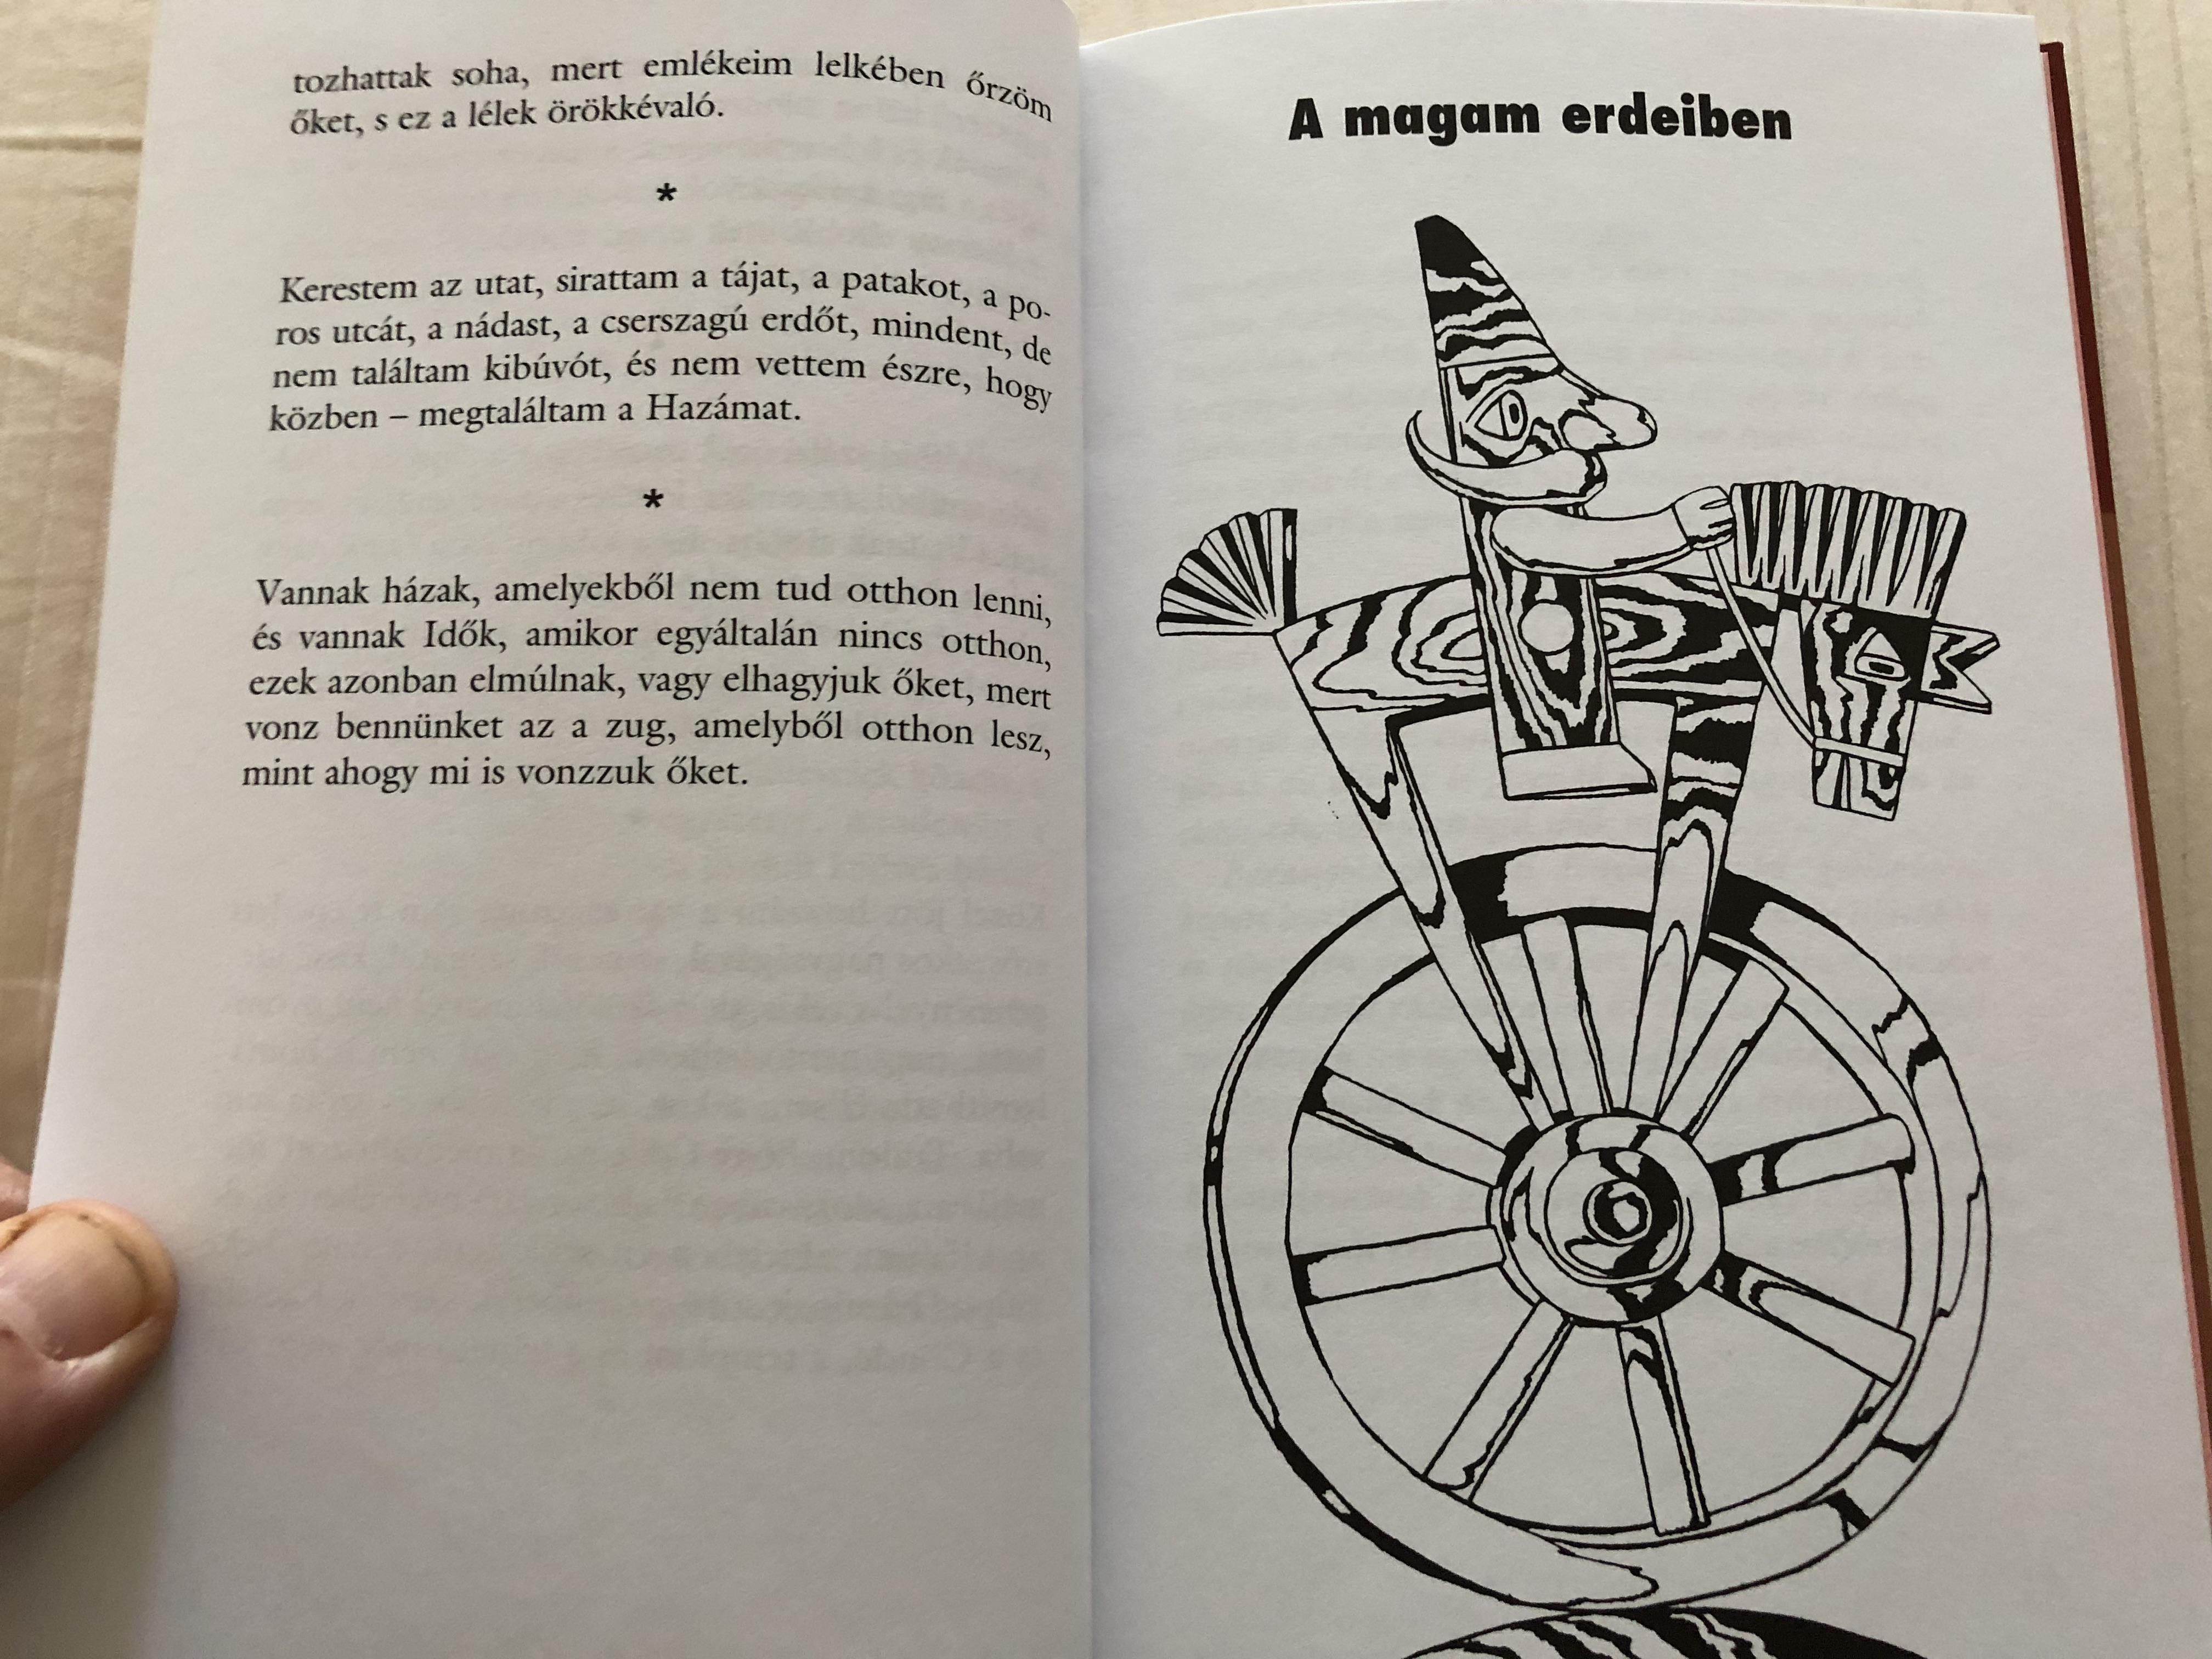 -alm-rium-f-vesk-nyv-by-fekete-istv-n-illustrations-by-vid-gy-z-m-ra-k-nyvkiad-2012-paperback-7-.jpg